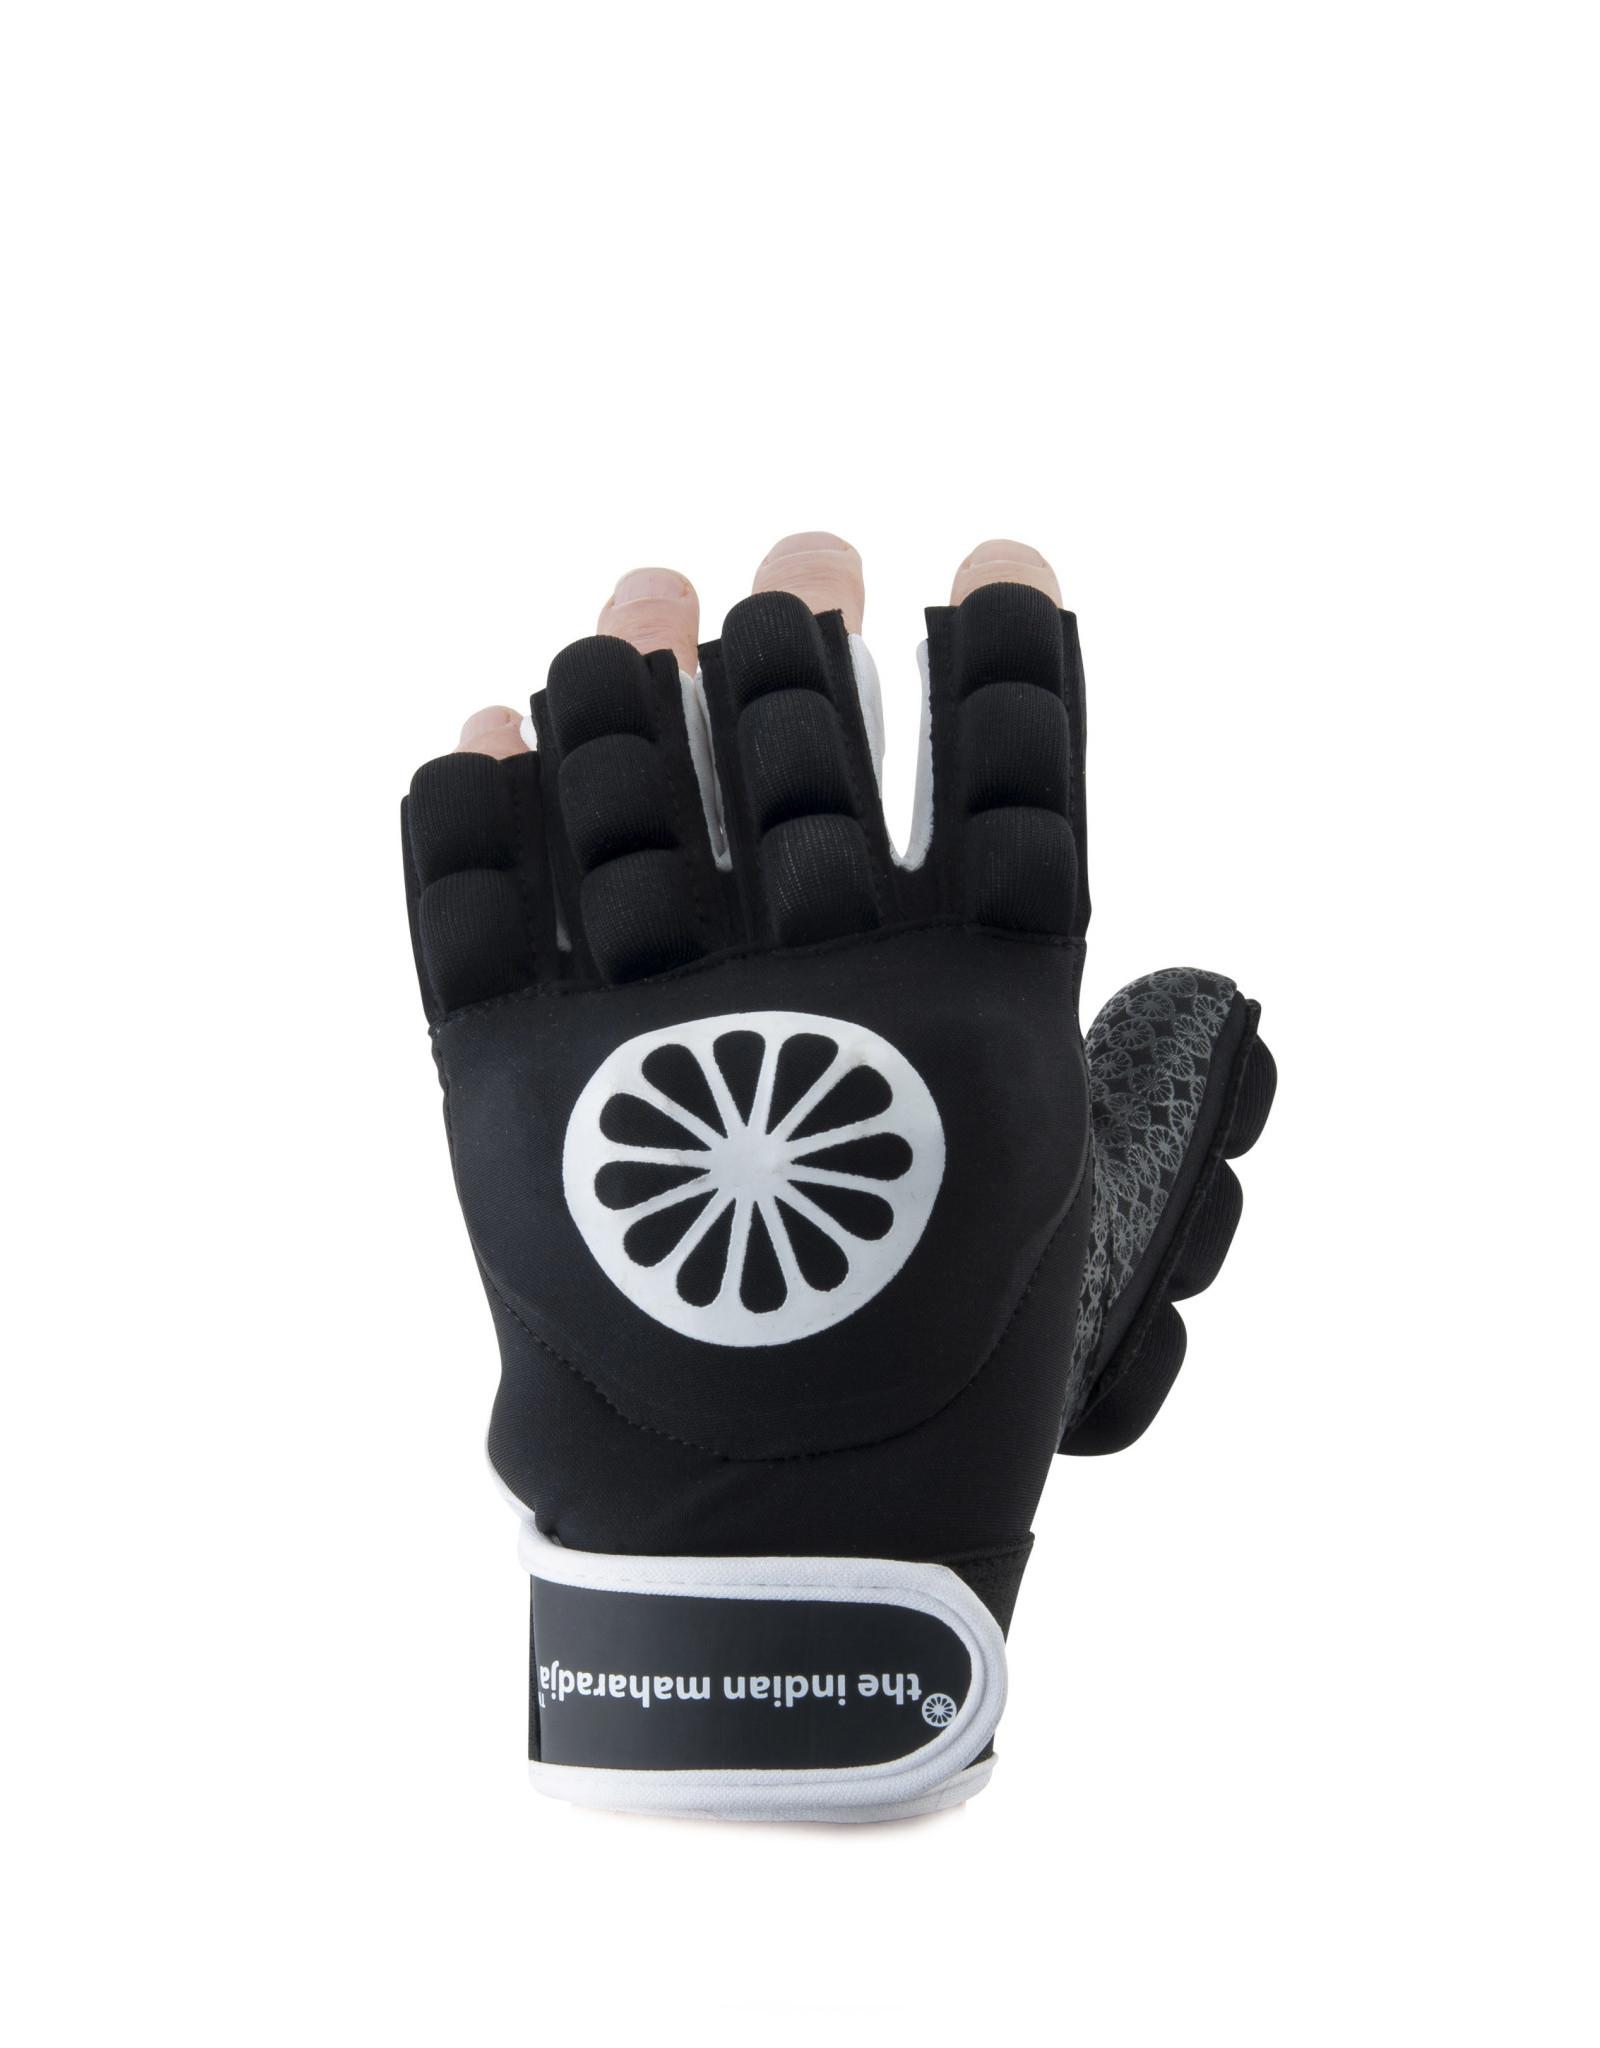 Maharadja Glove shell/foam half [left]-black-M